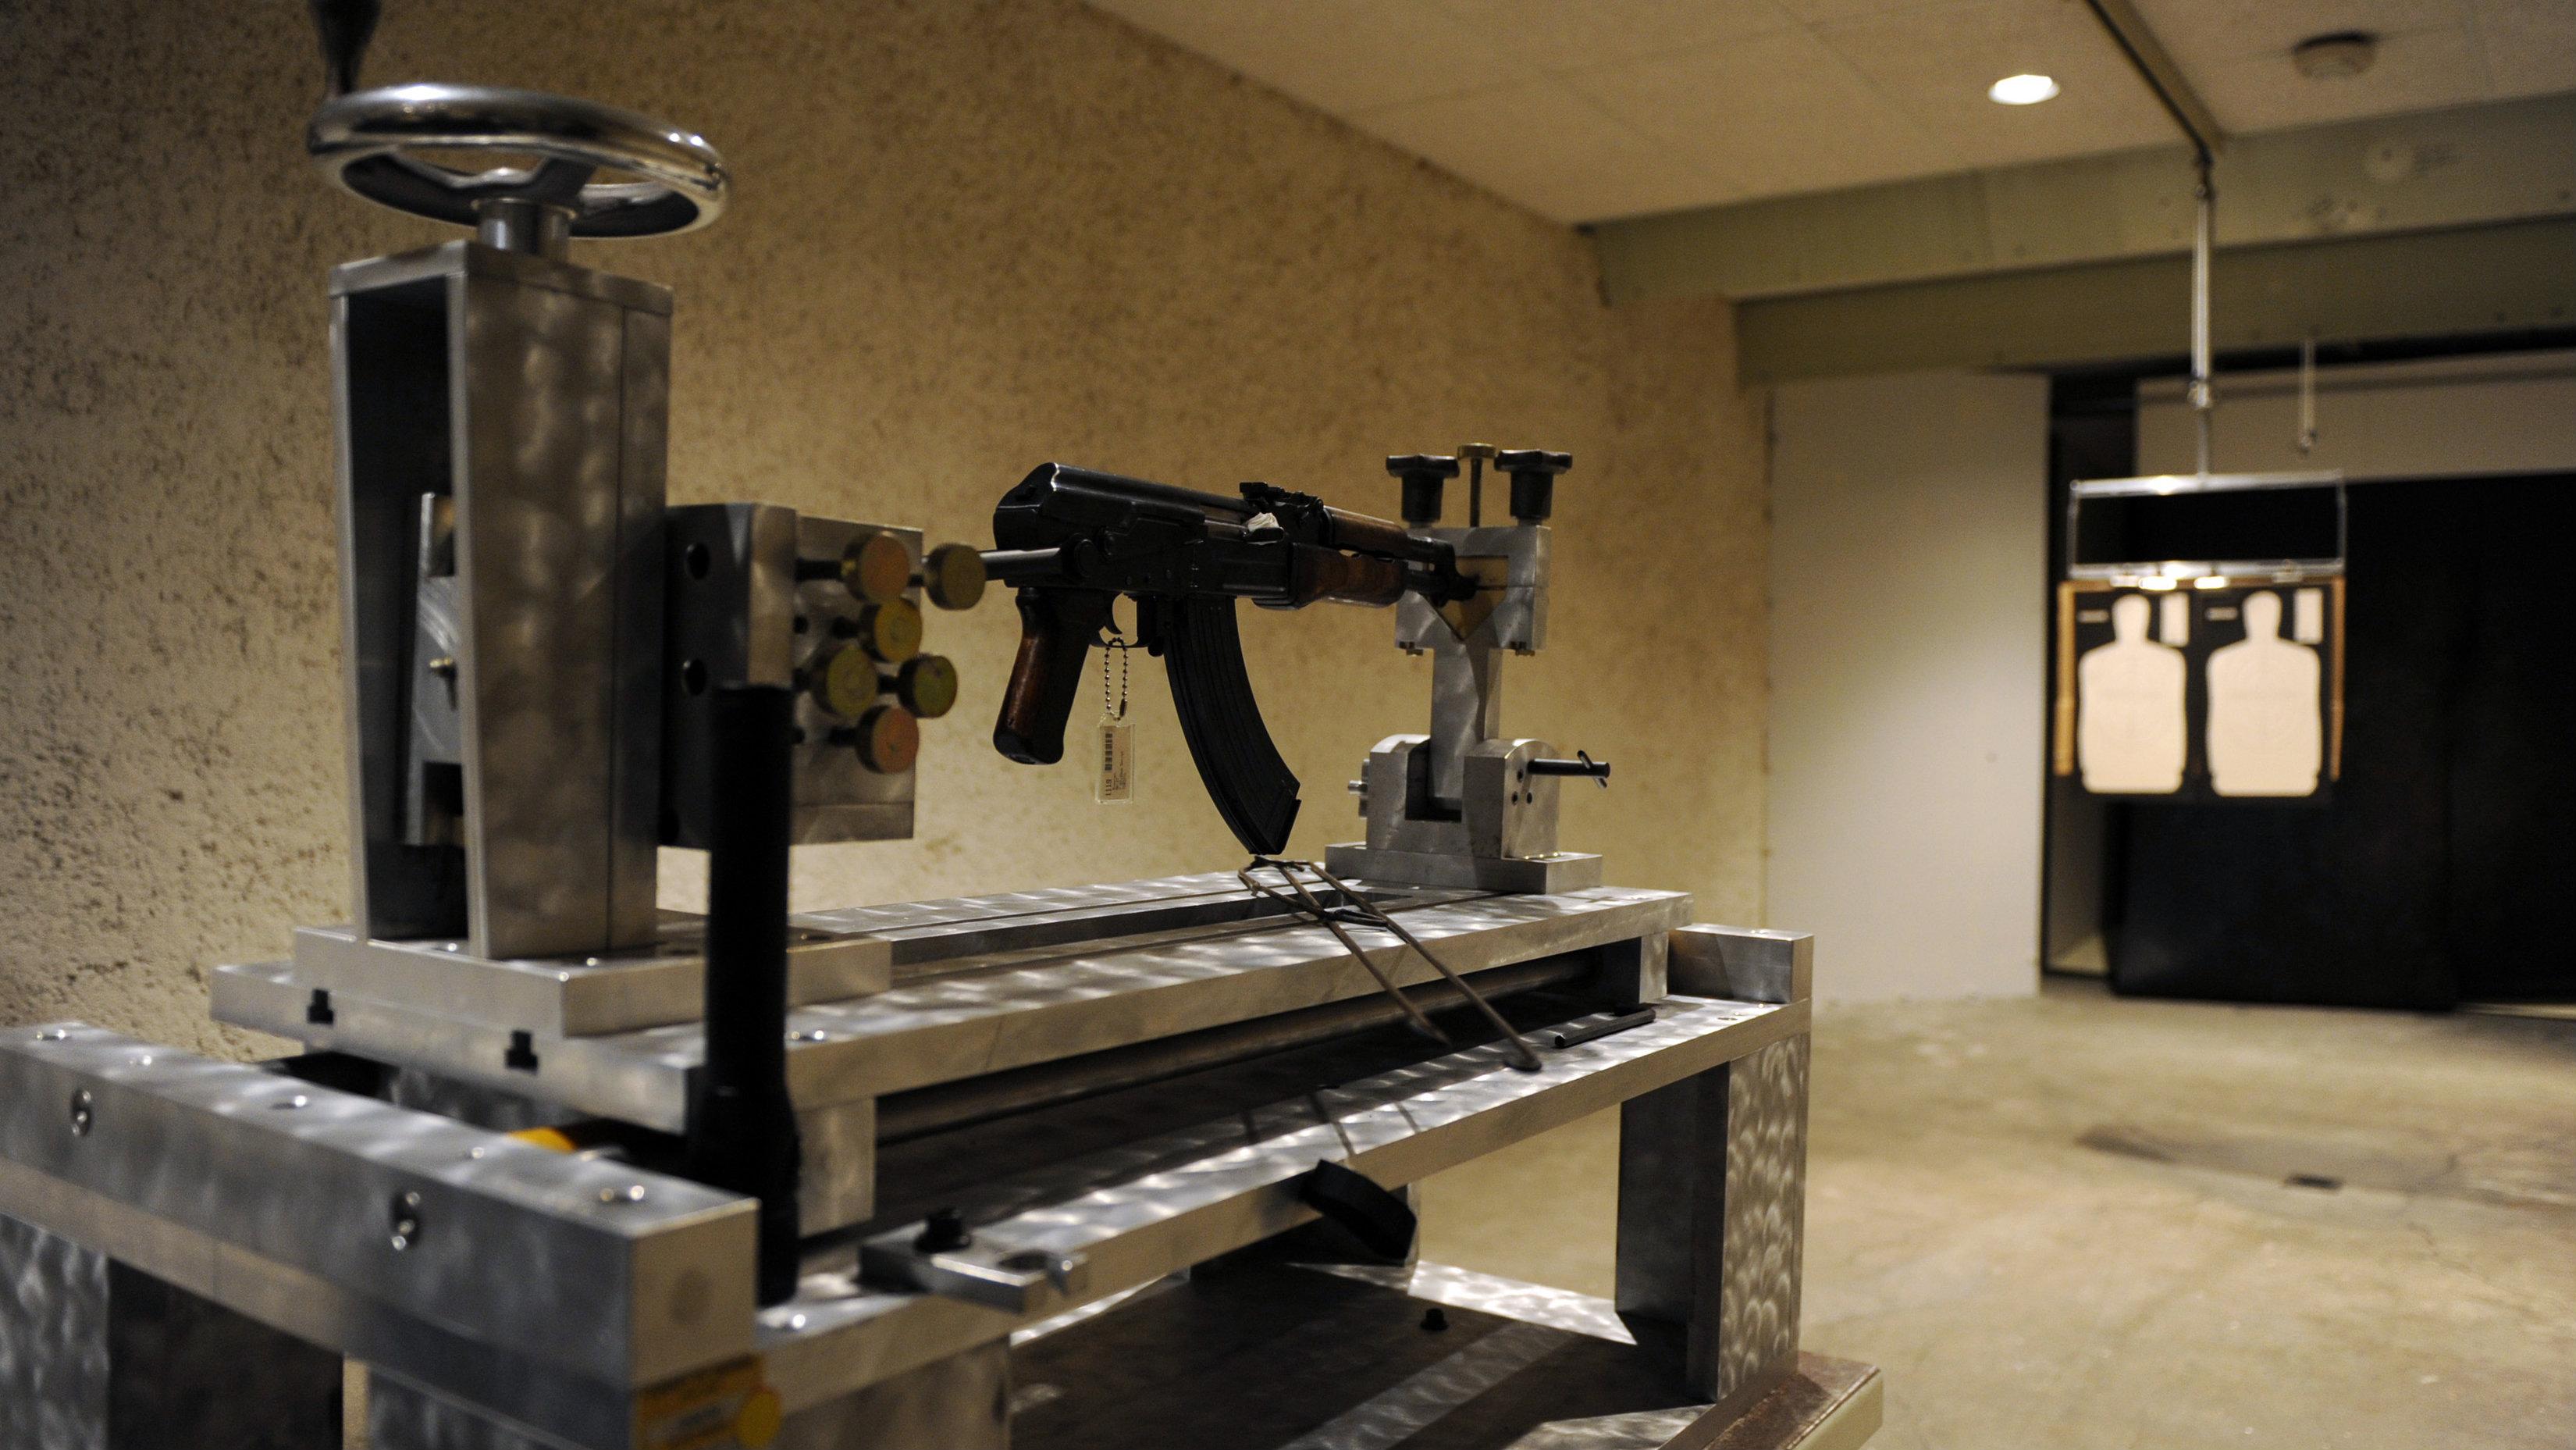 gun aimed at target